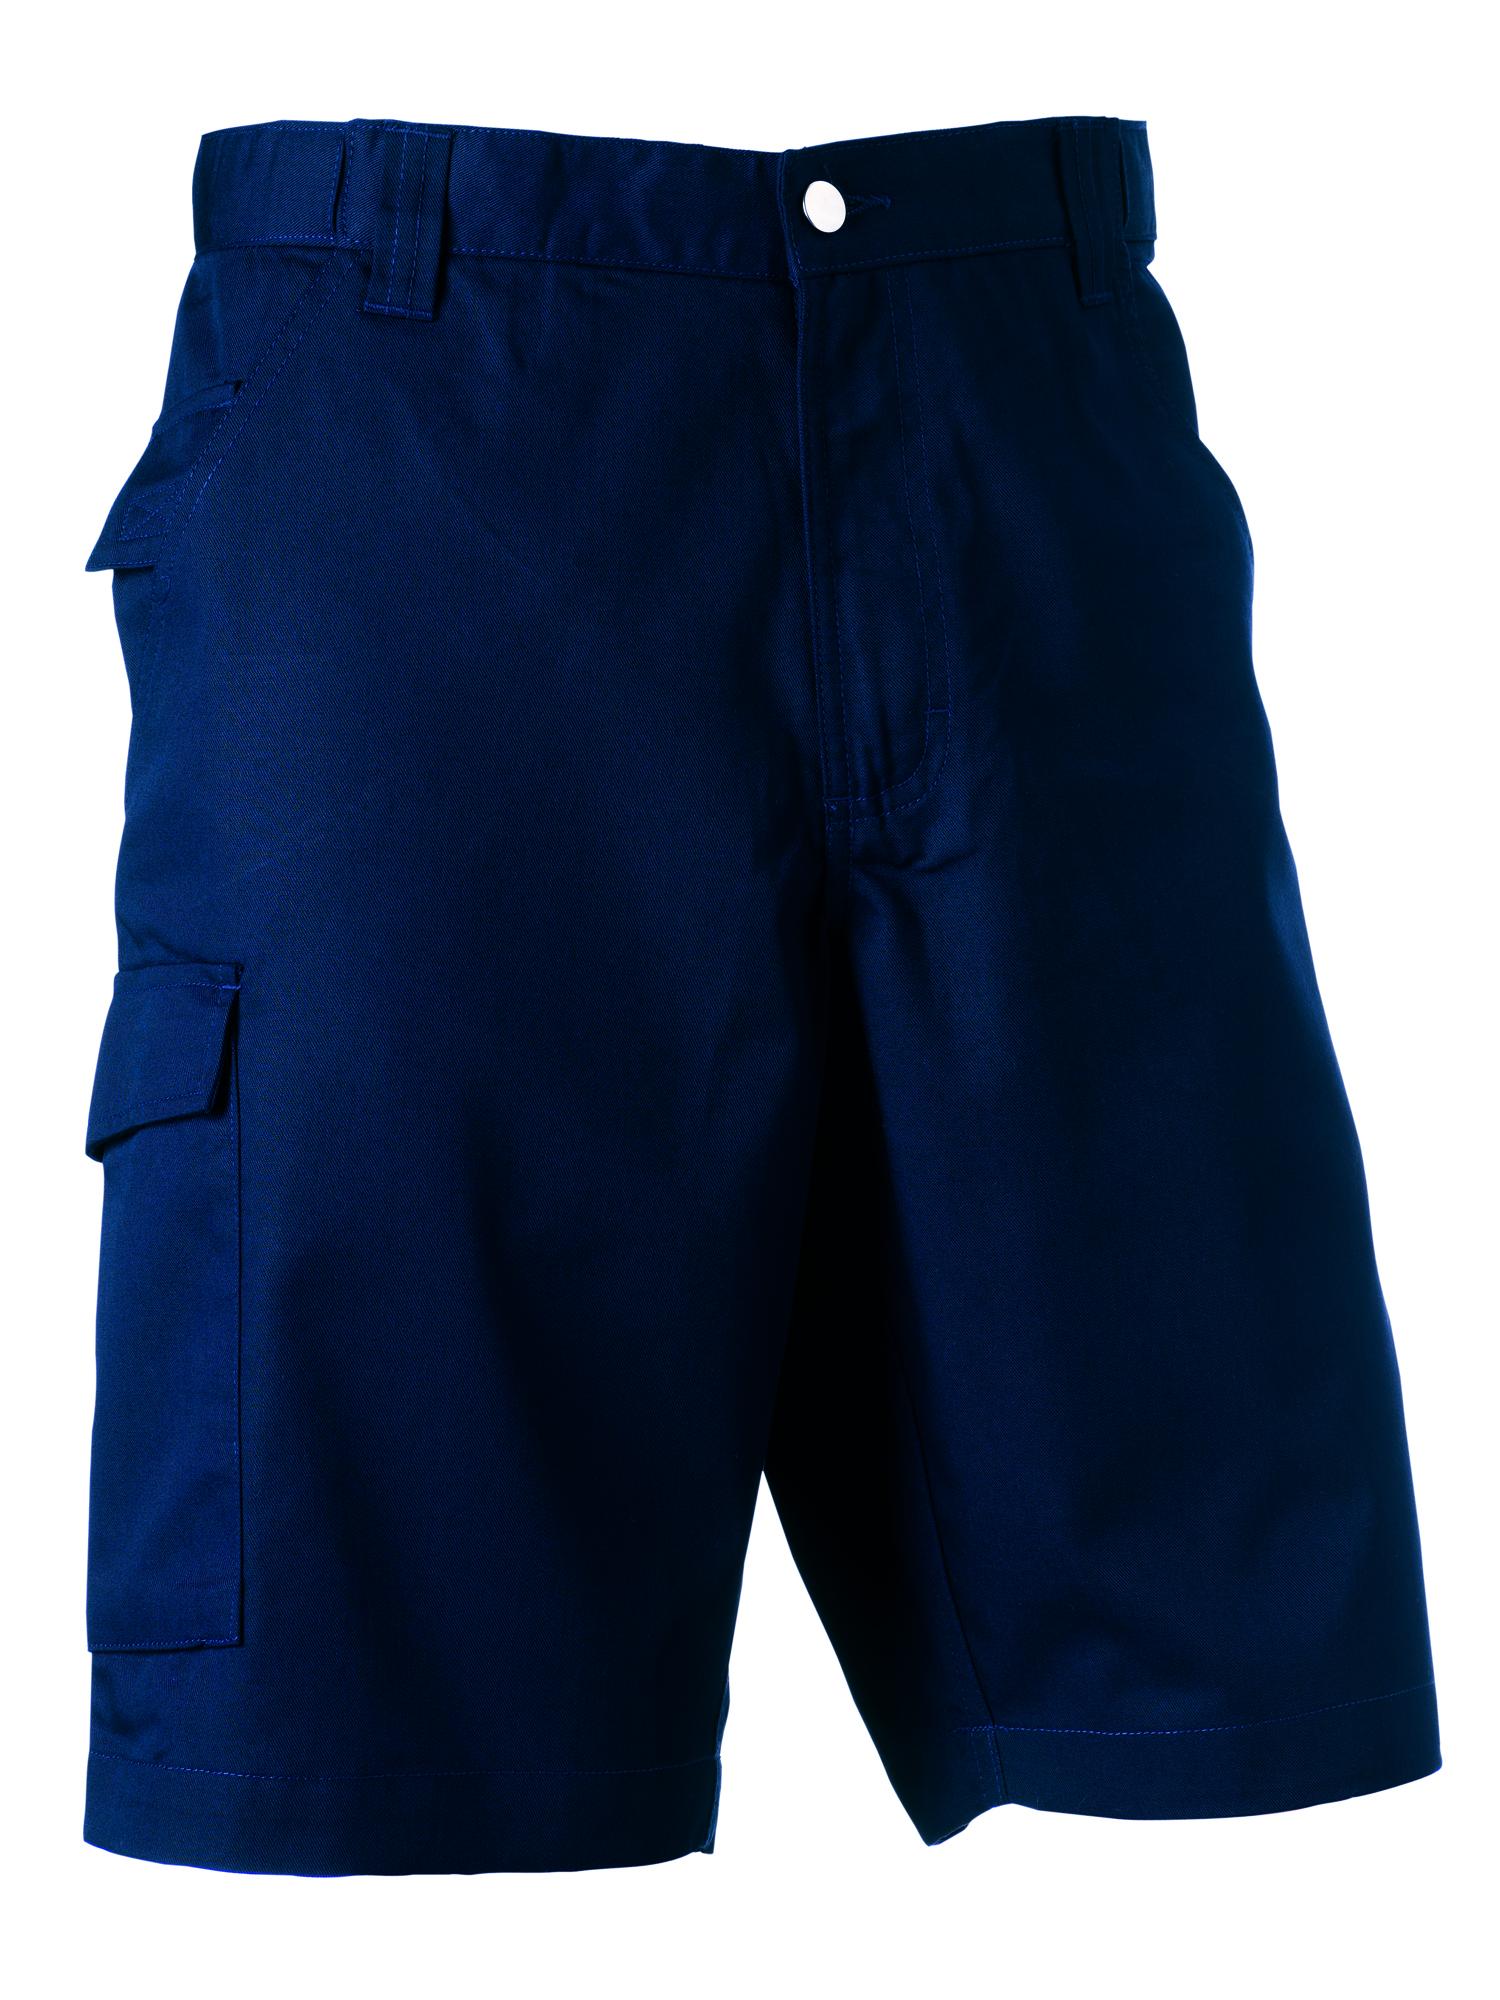 Polycotton Twill Shorts